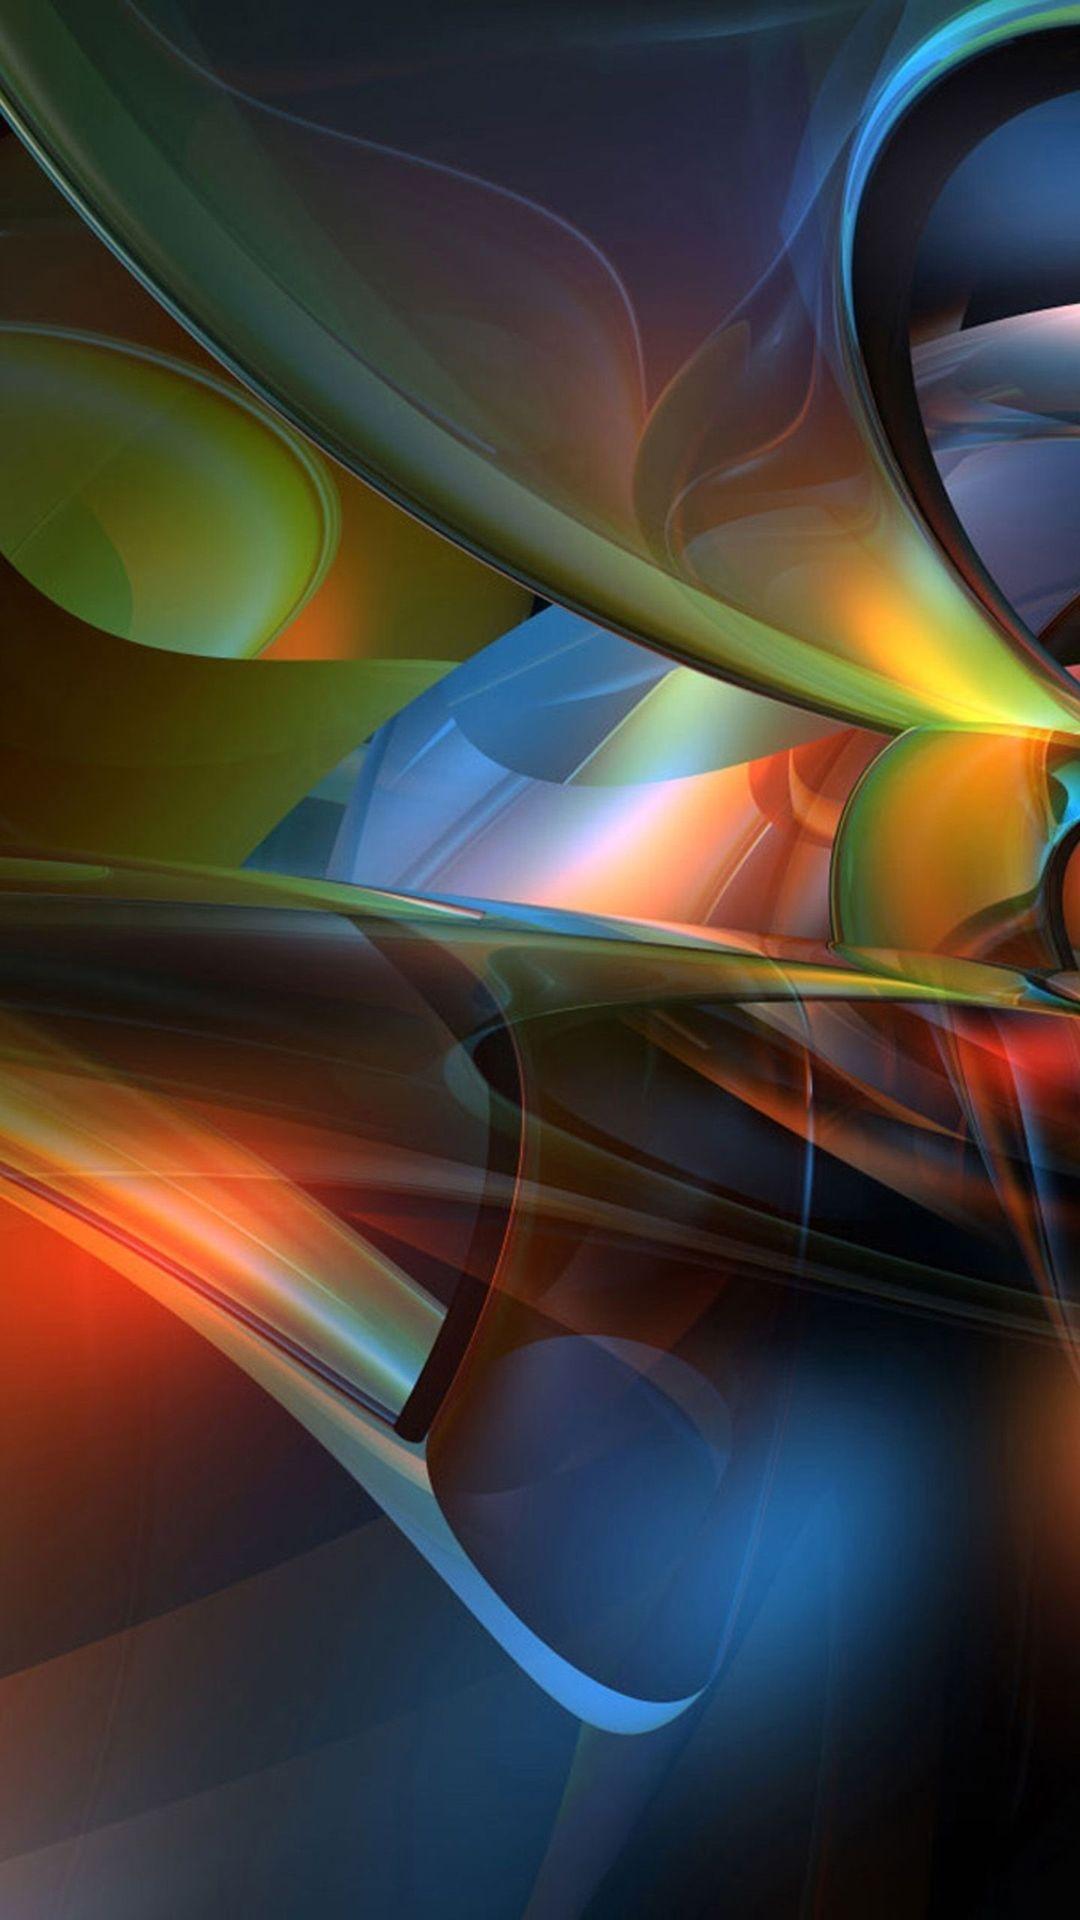 3d abstract mobile phone wallpaper 1080x1920 ololoshenka